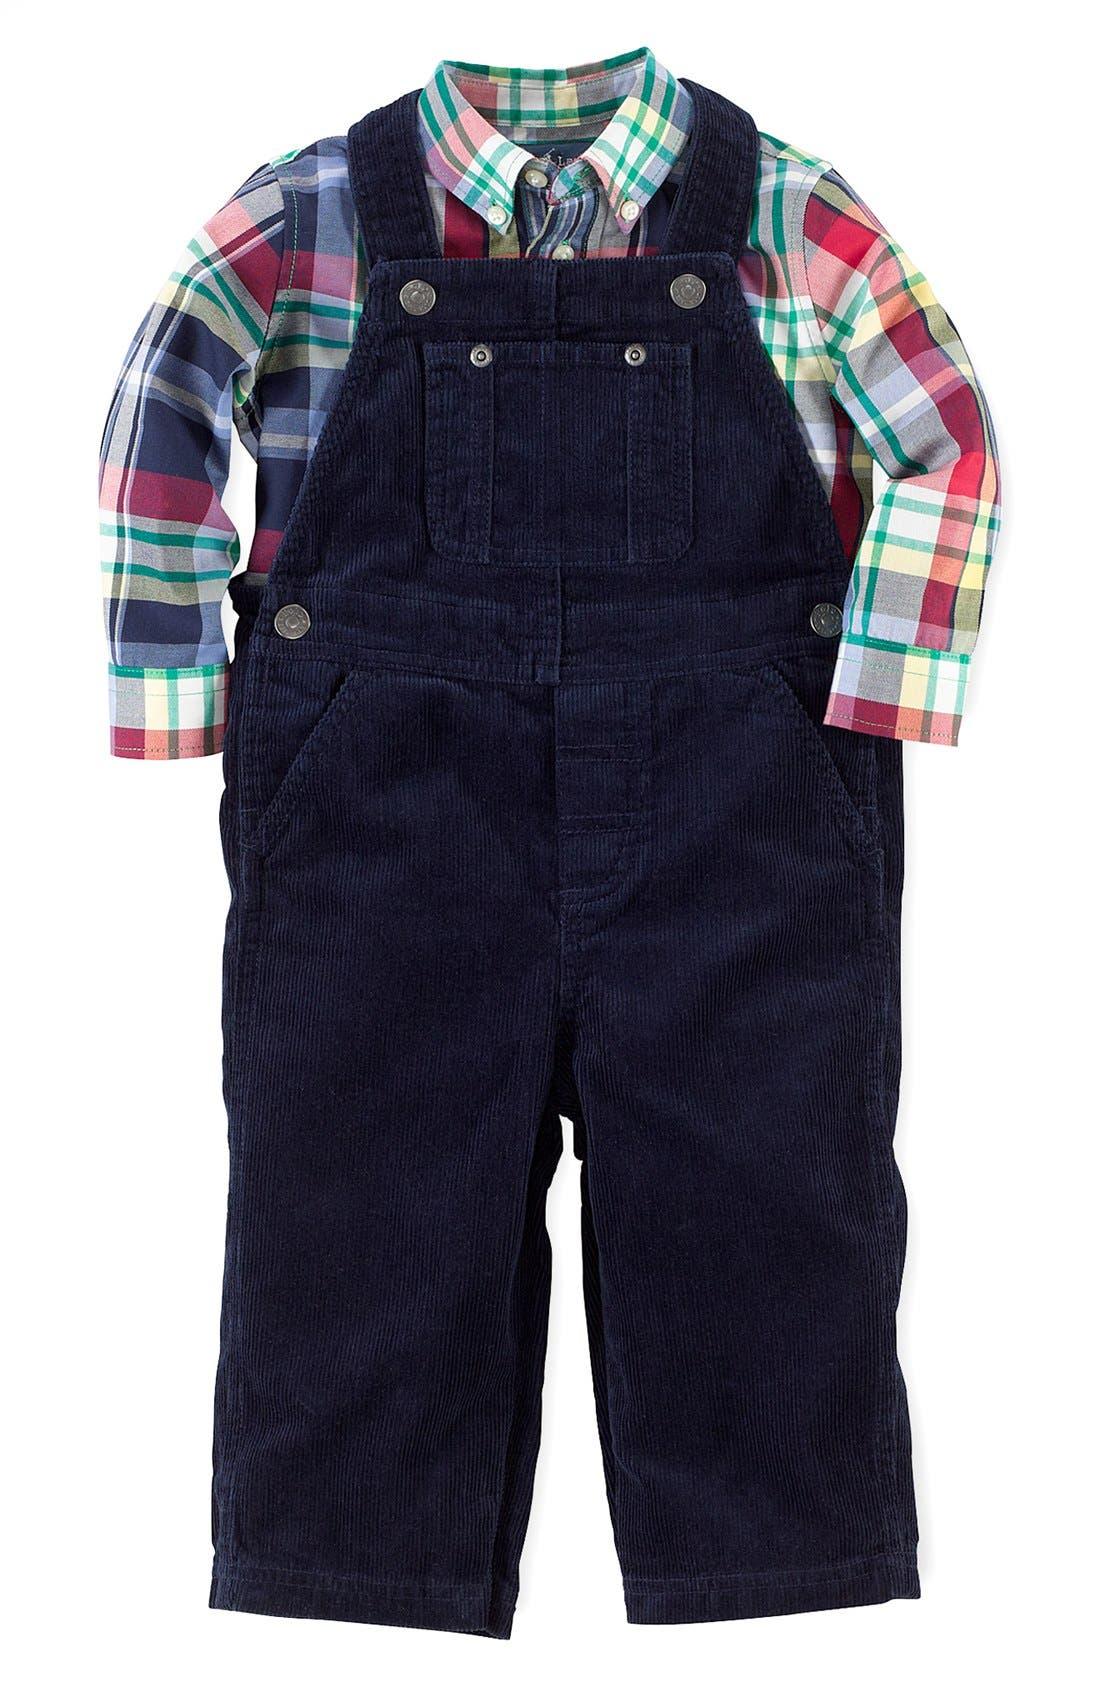 Alternate Image 1 Selected - Ralph Lauren Shirt & Overalls (Baby Boys)